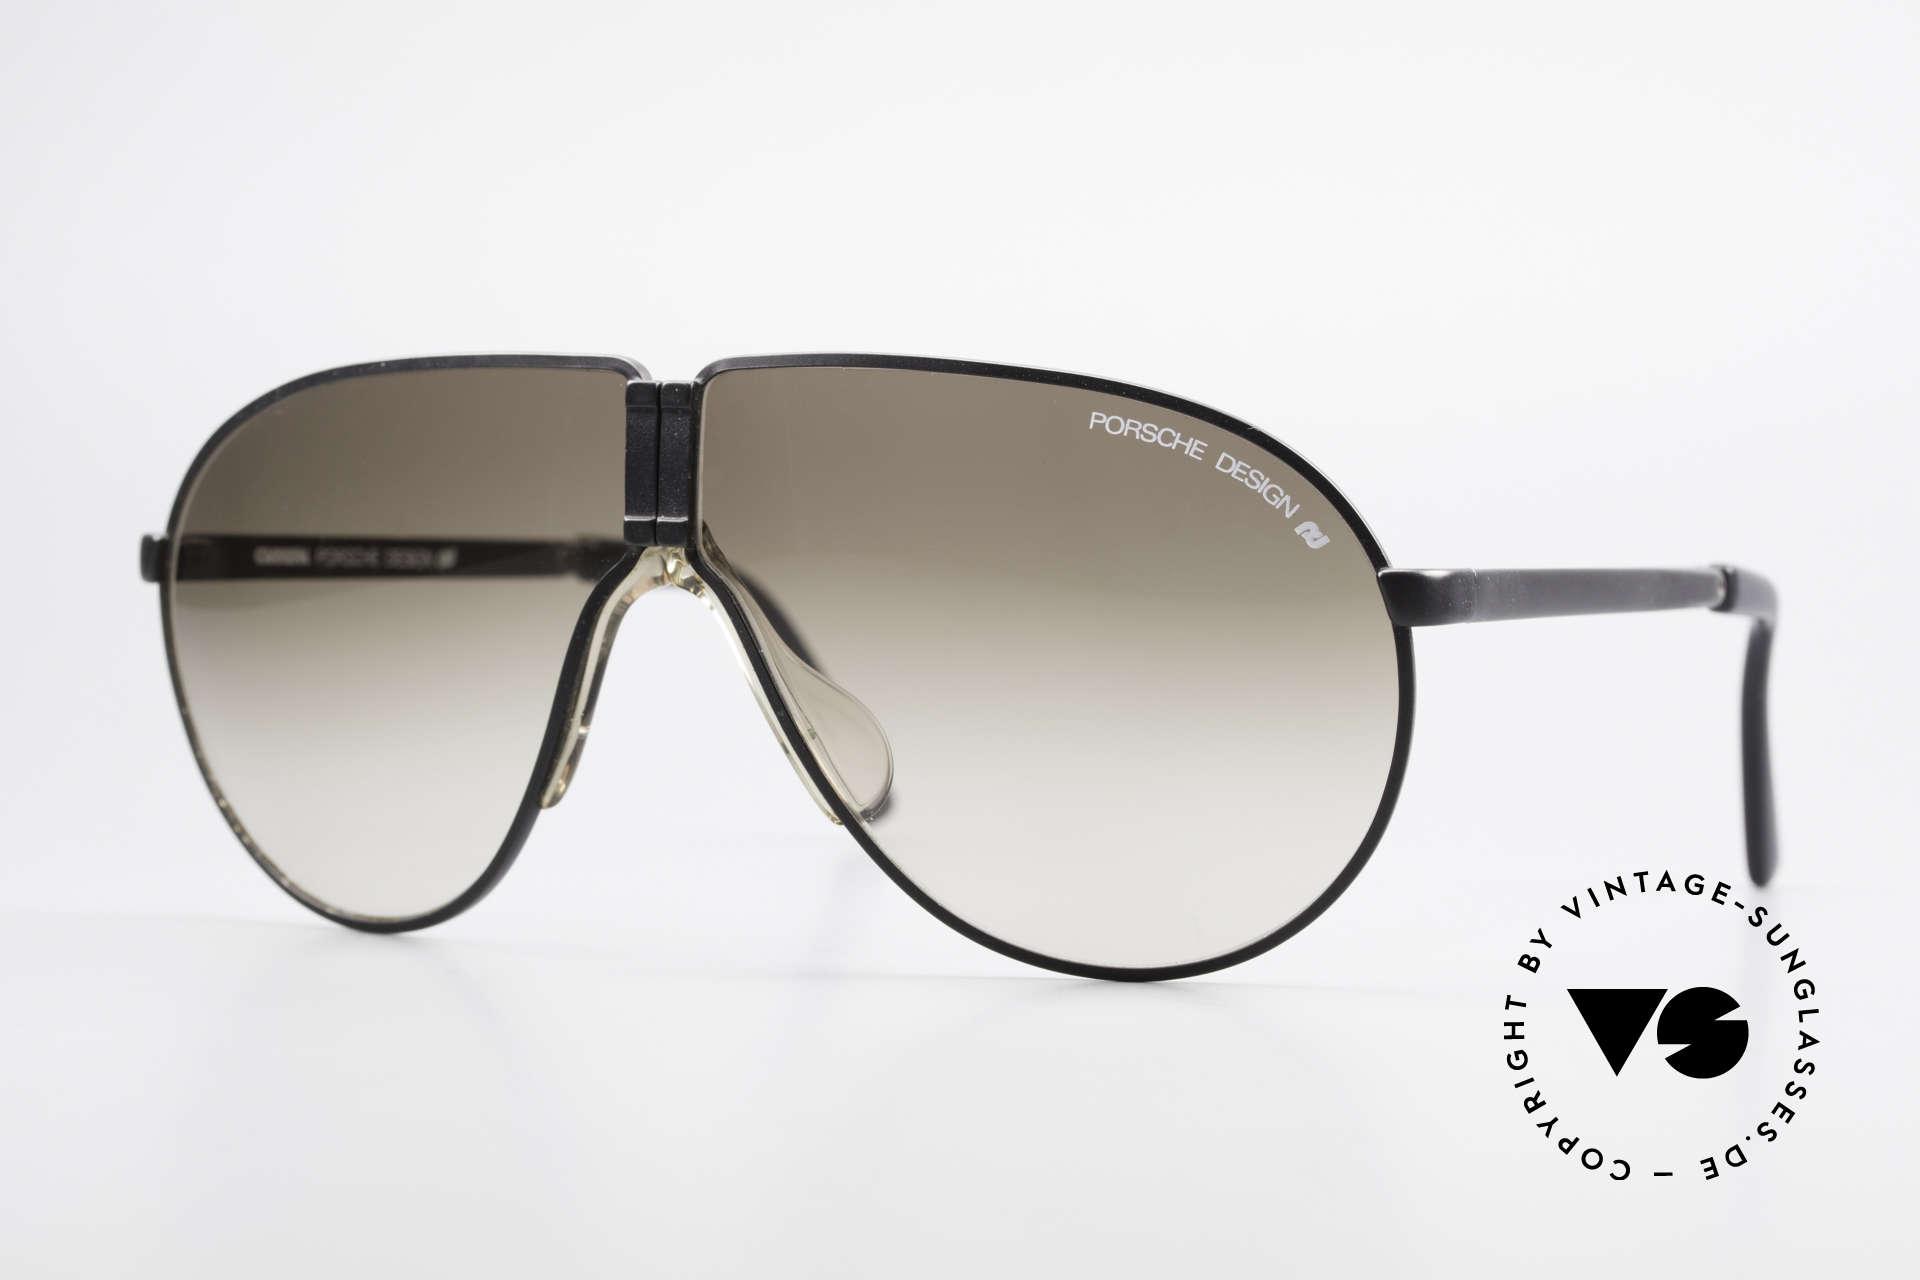 05234ff441005 Sunglasses Porsche 5622 Rare Folding Sunglasses 80 s